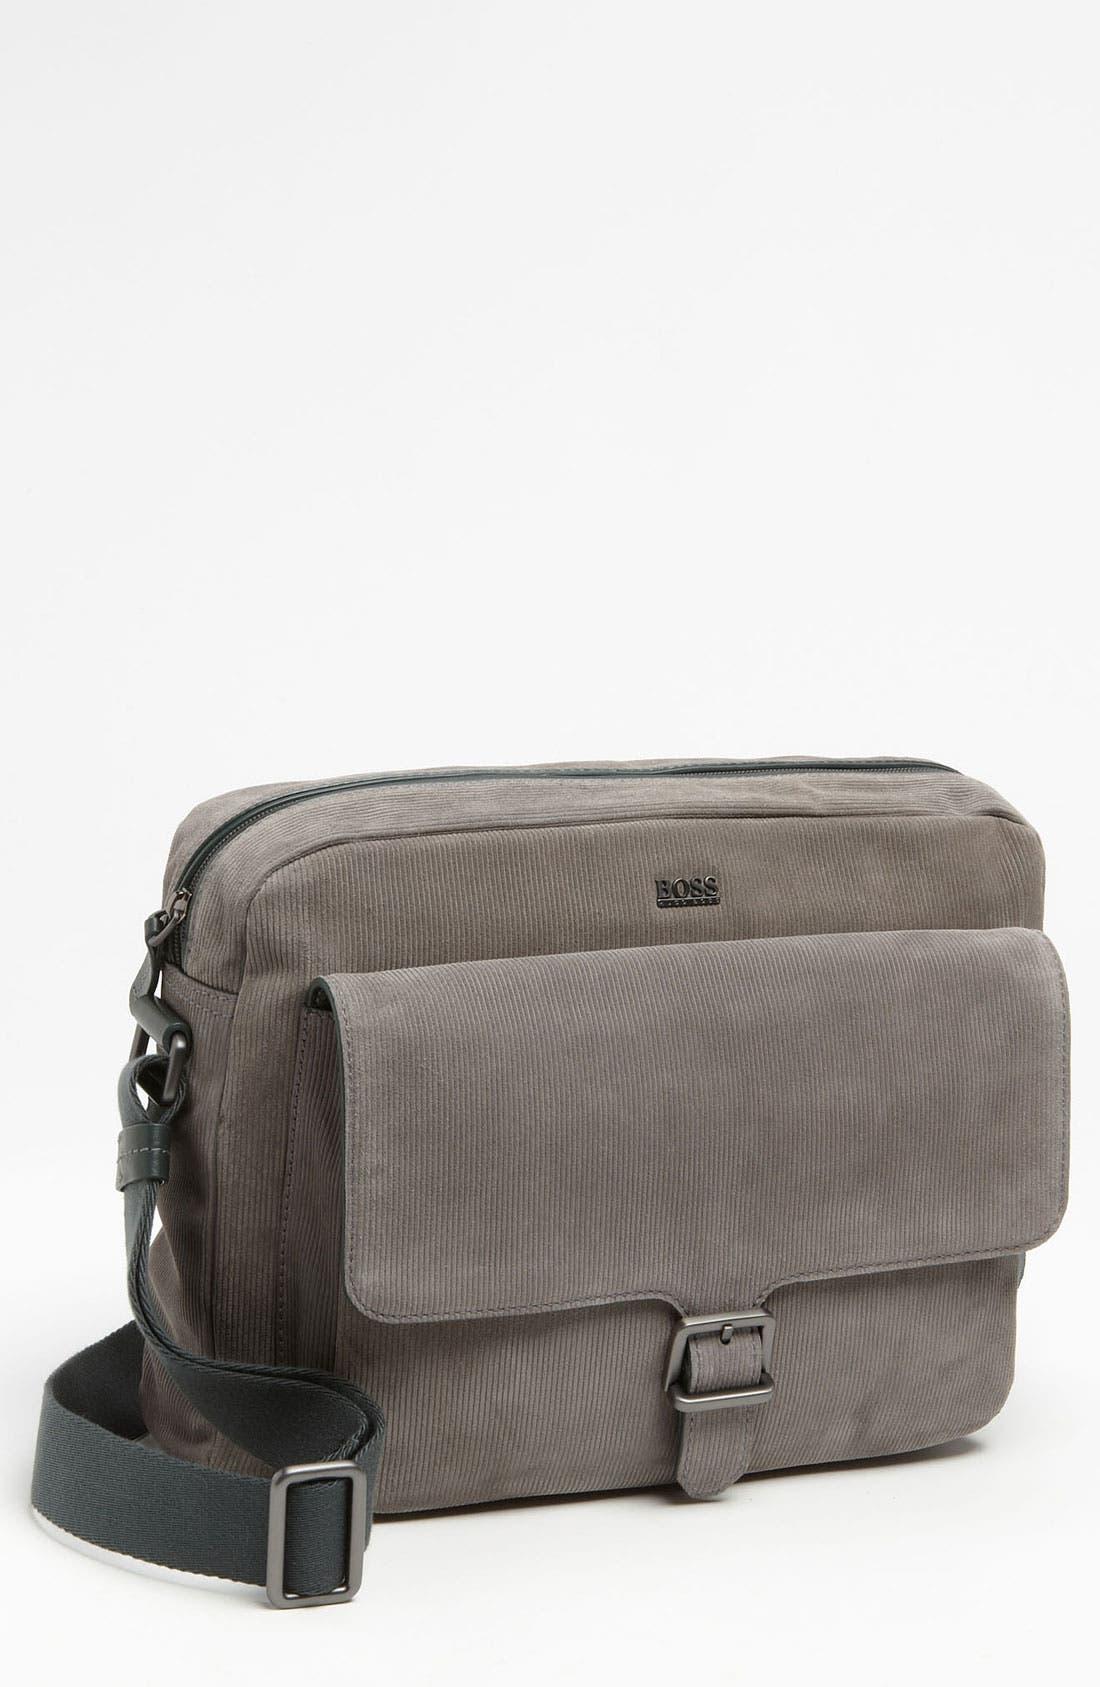 Main Image - BOSS Black 'Carmos' Messenger Bag